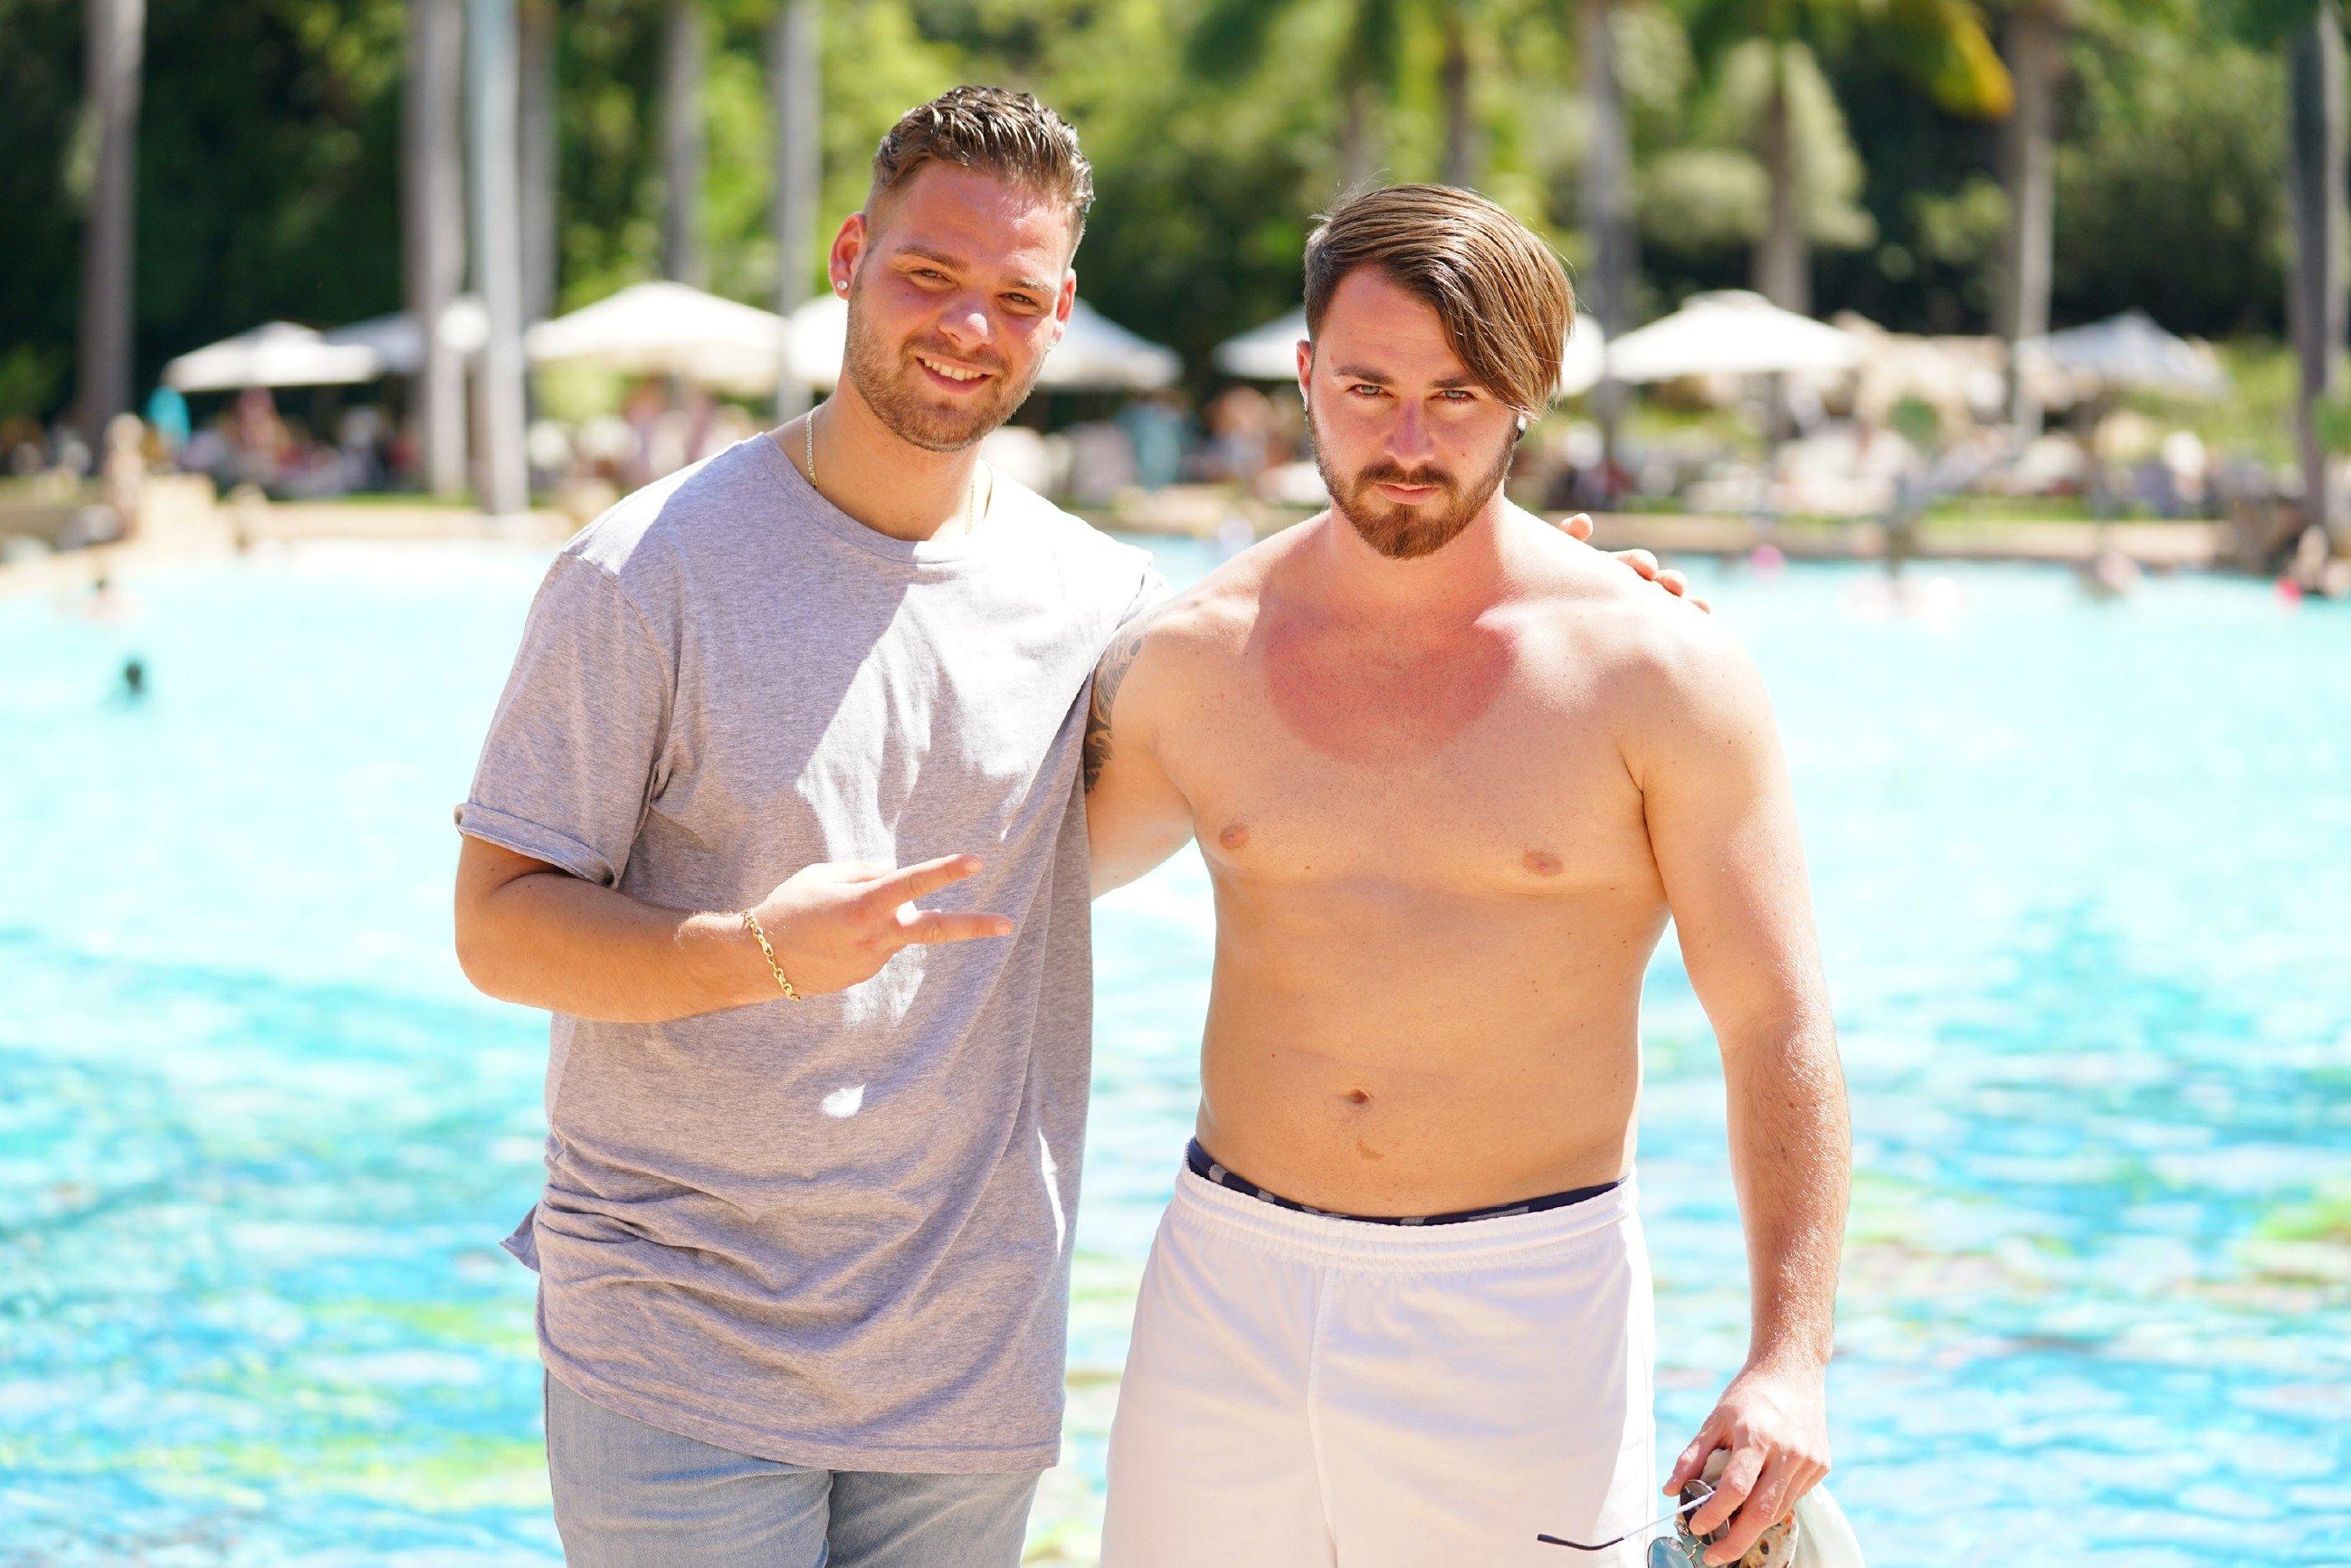 Santo Rotolo und Michel Truog am Pool - Recall DSDS 2018 Südafrika